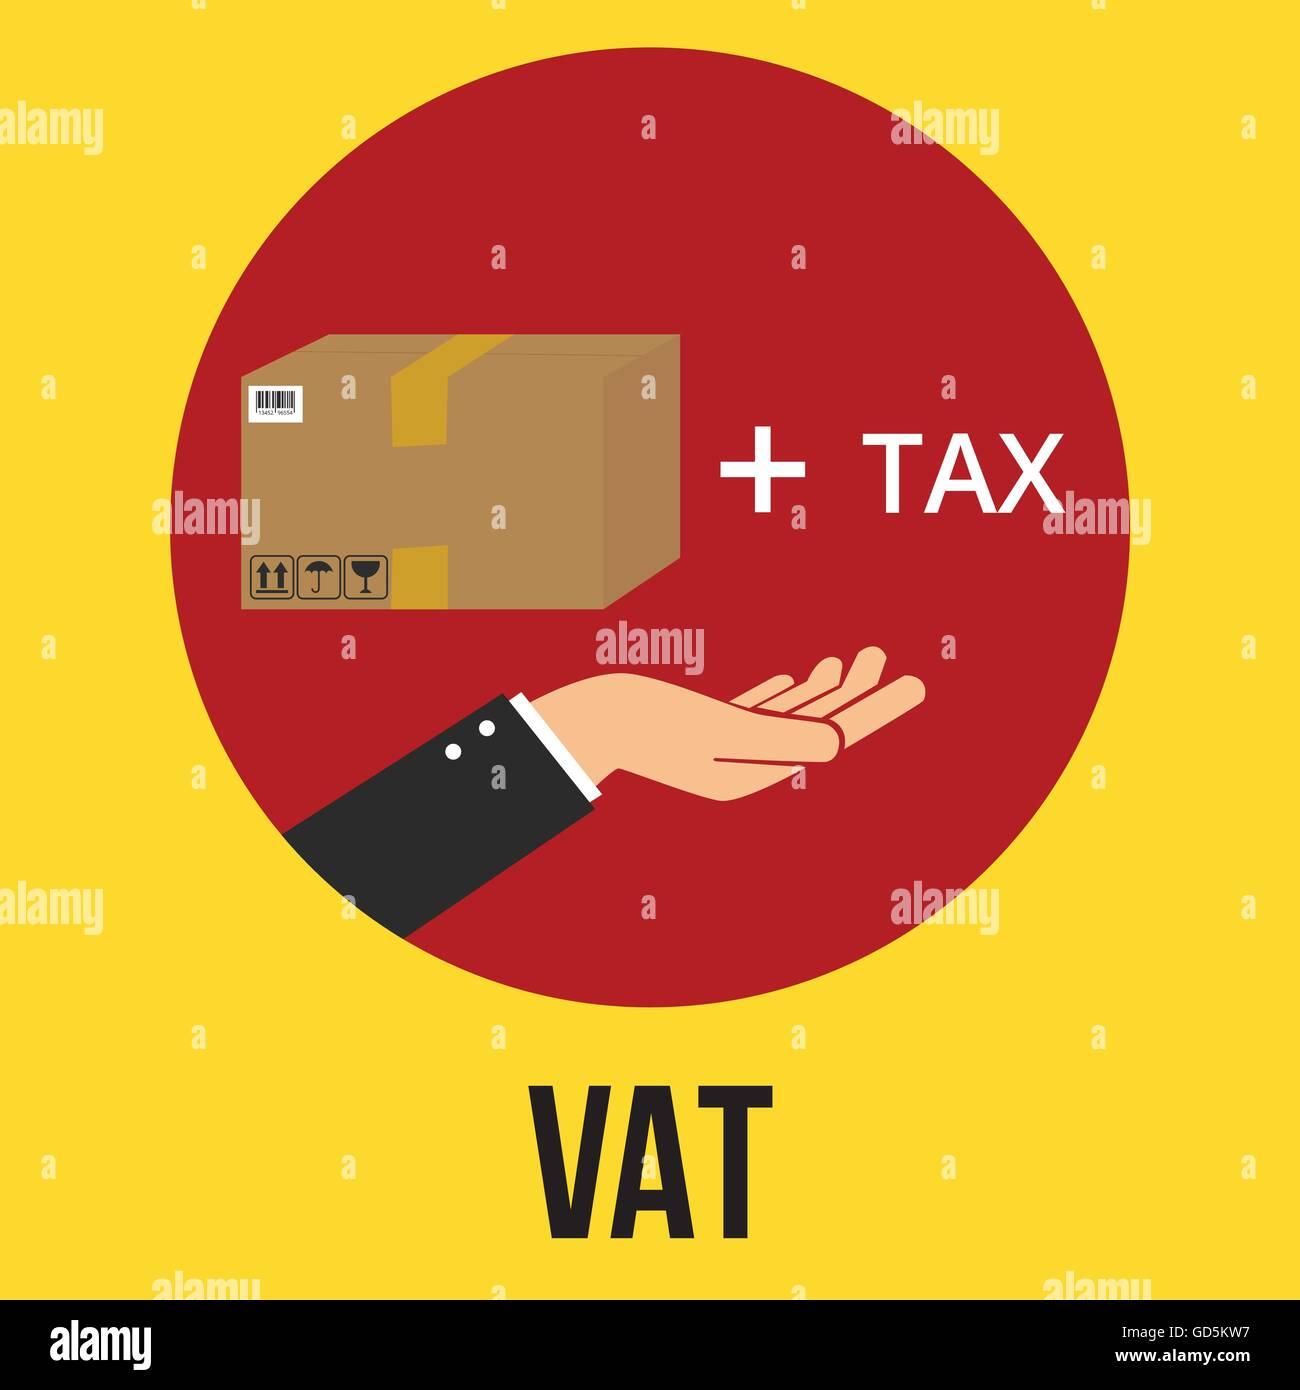 vat value added tax illustration goods plus tax and customer vector - Stock Vector